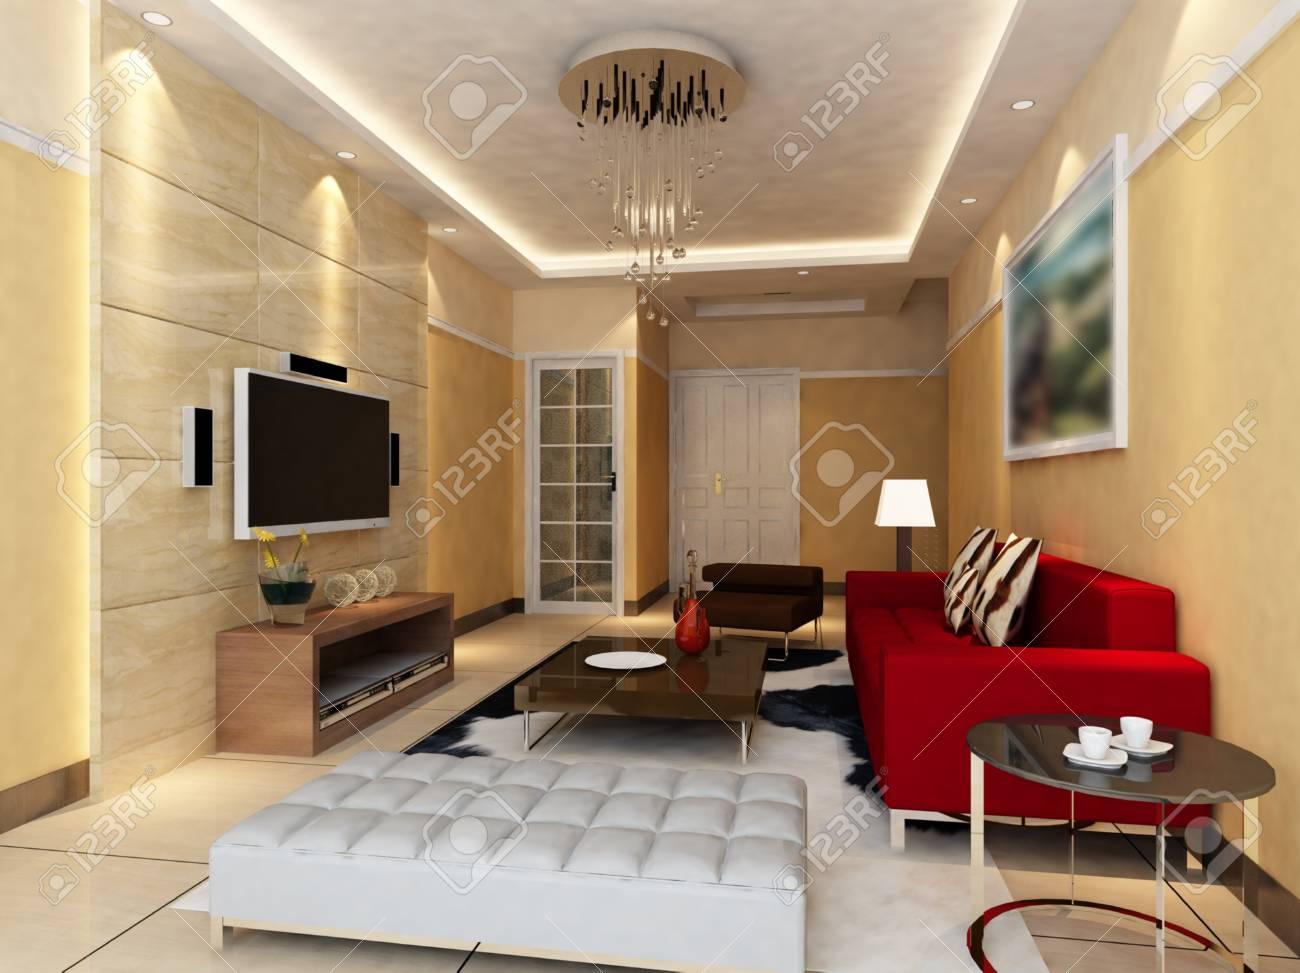 Interior fashionable living-room rendering Stock Photo - 9535066